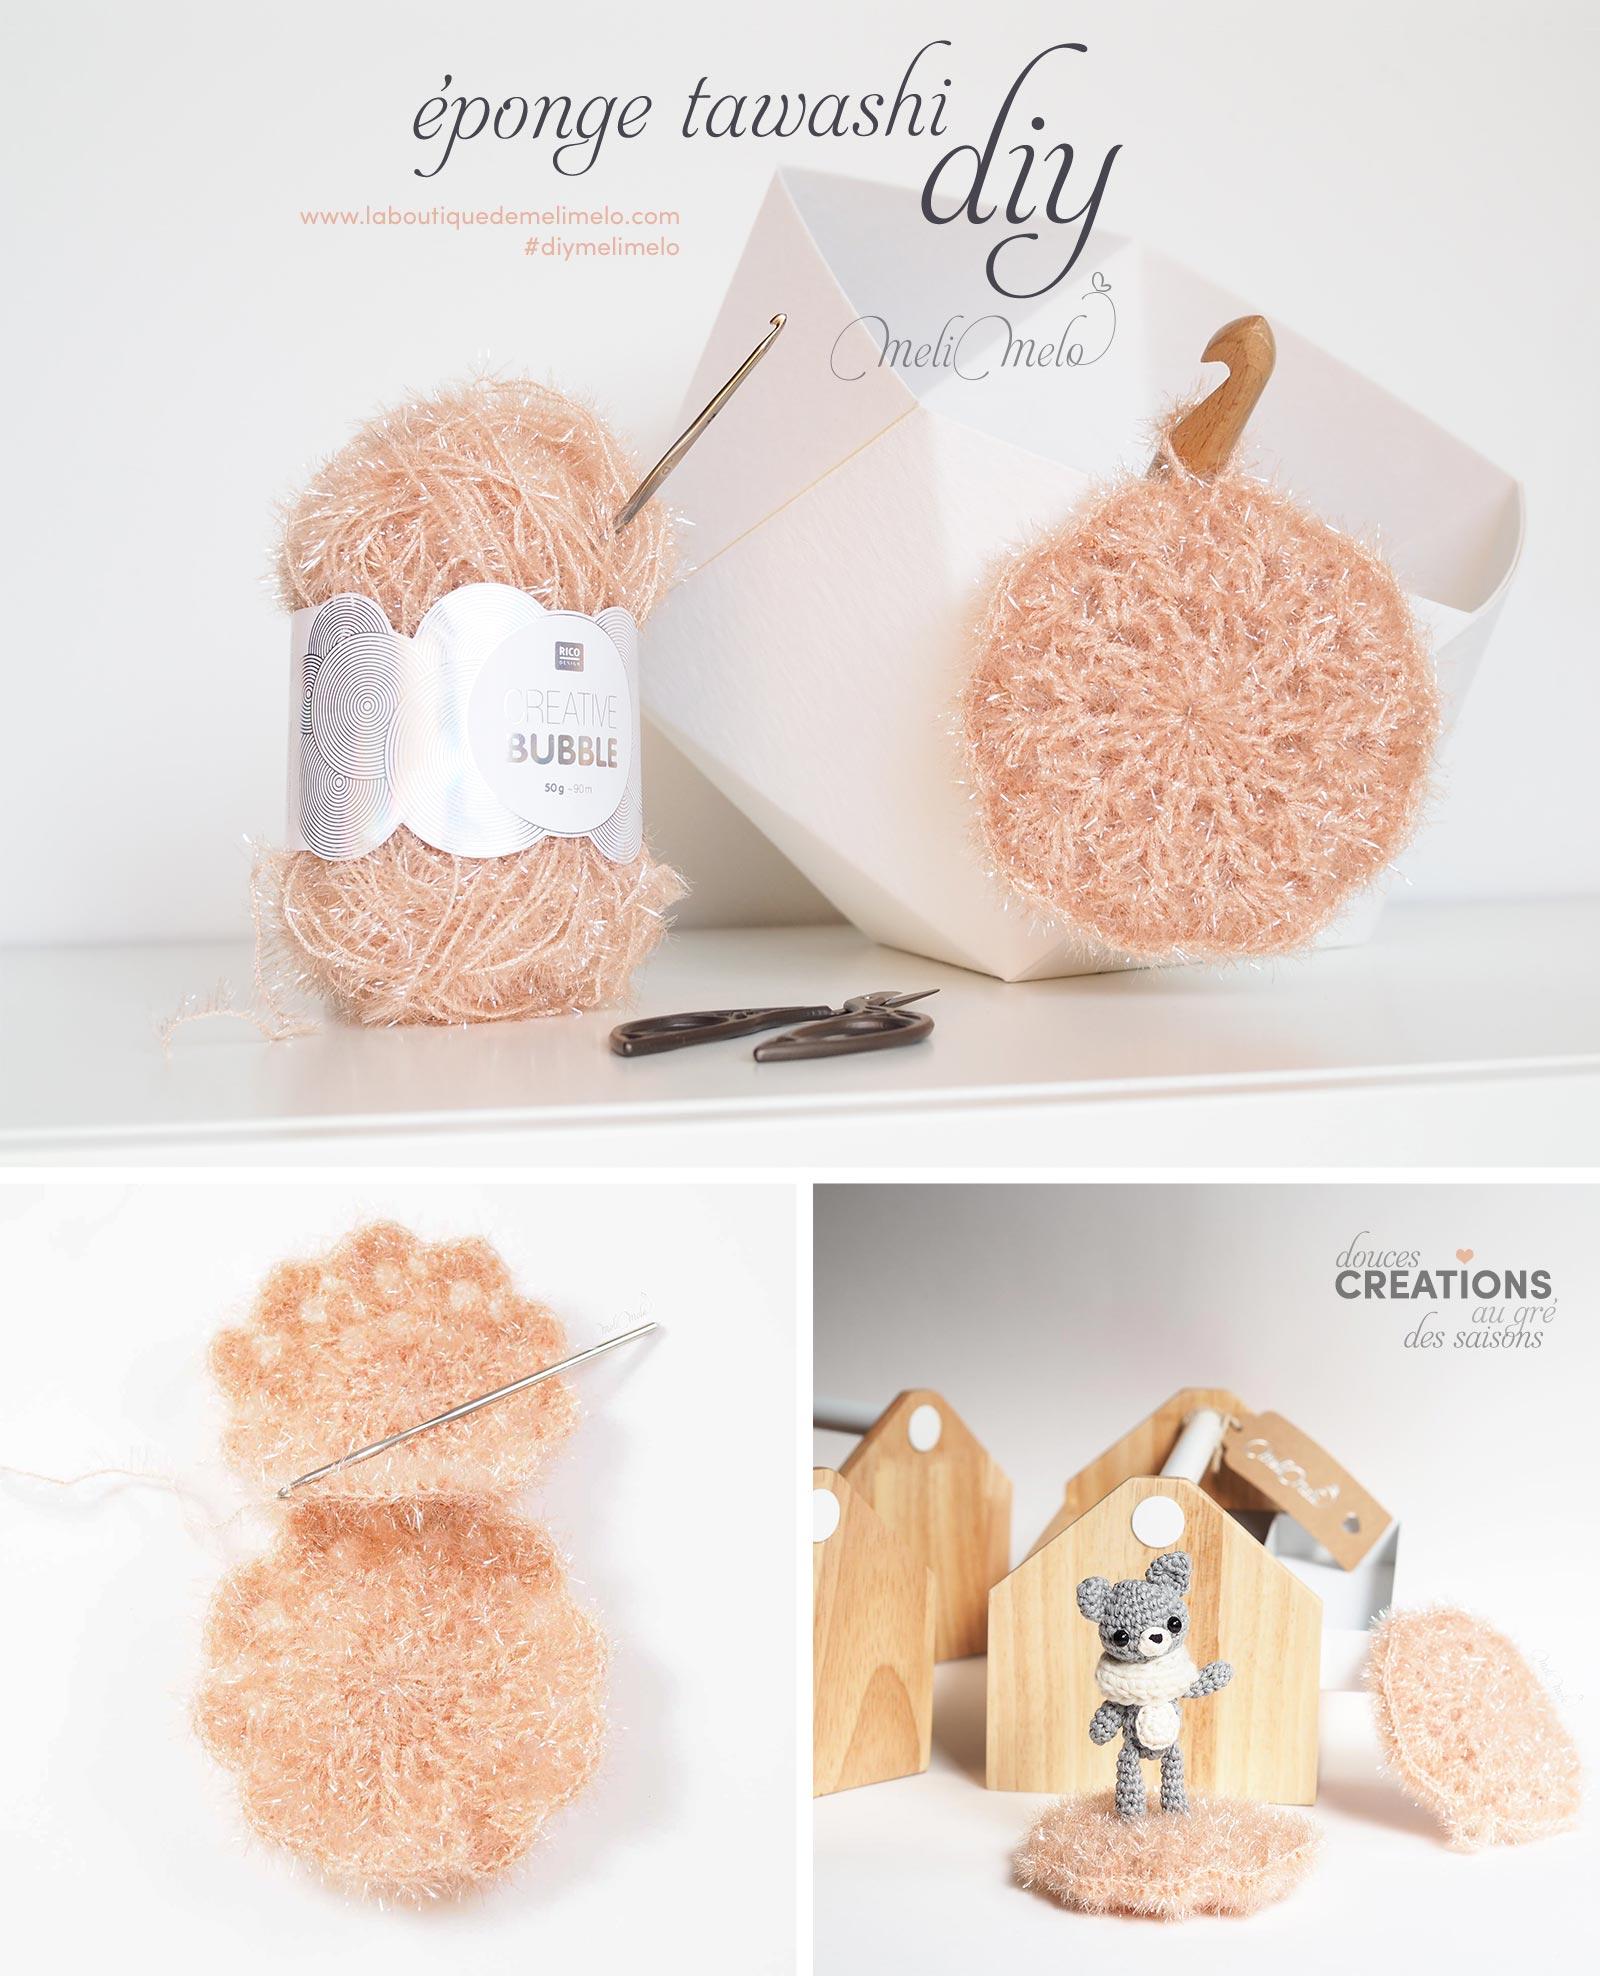 diy tuto crochet éponge tawashi créative bubble ricodesign diymelimelo laboutiquedemelimelo